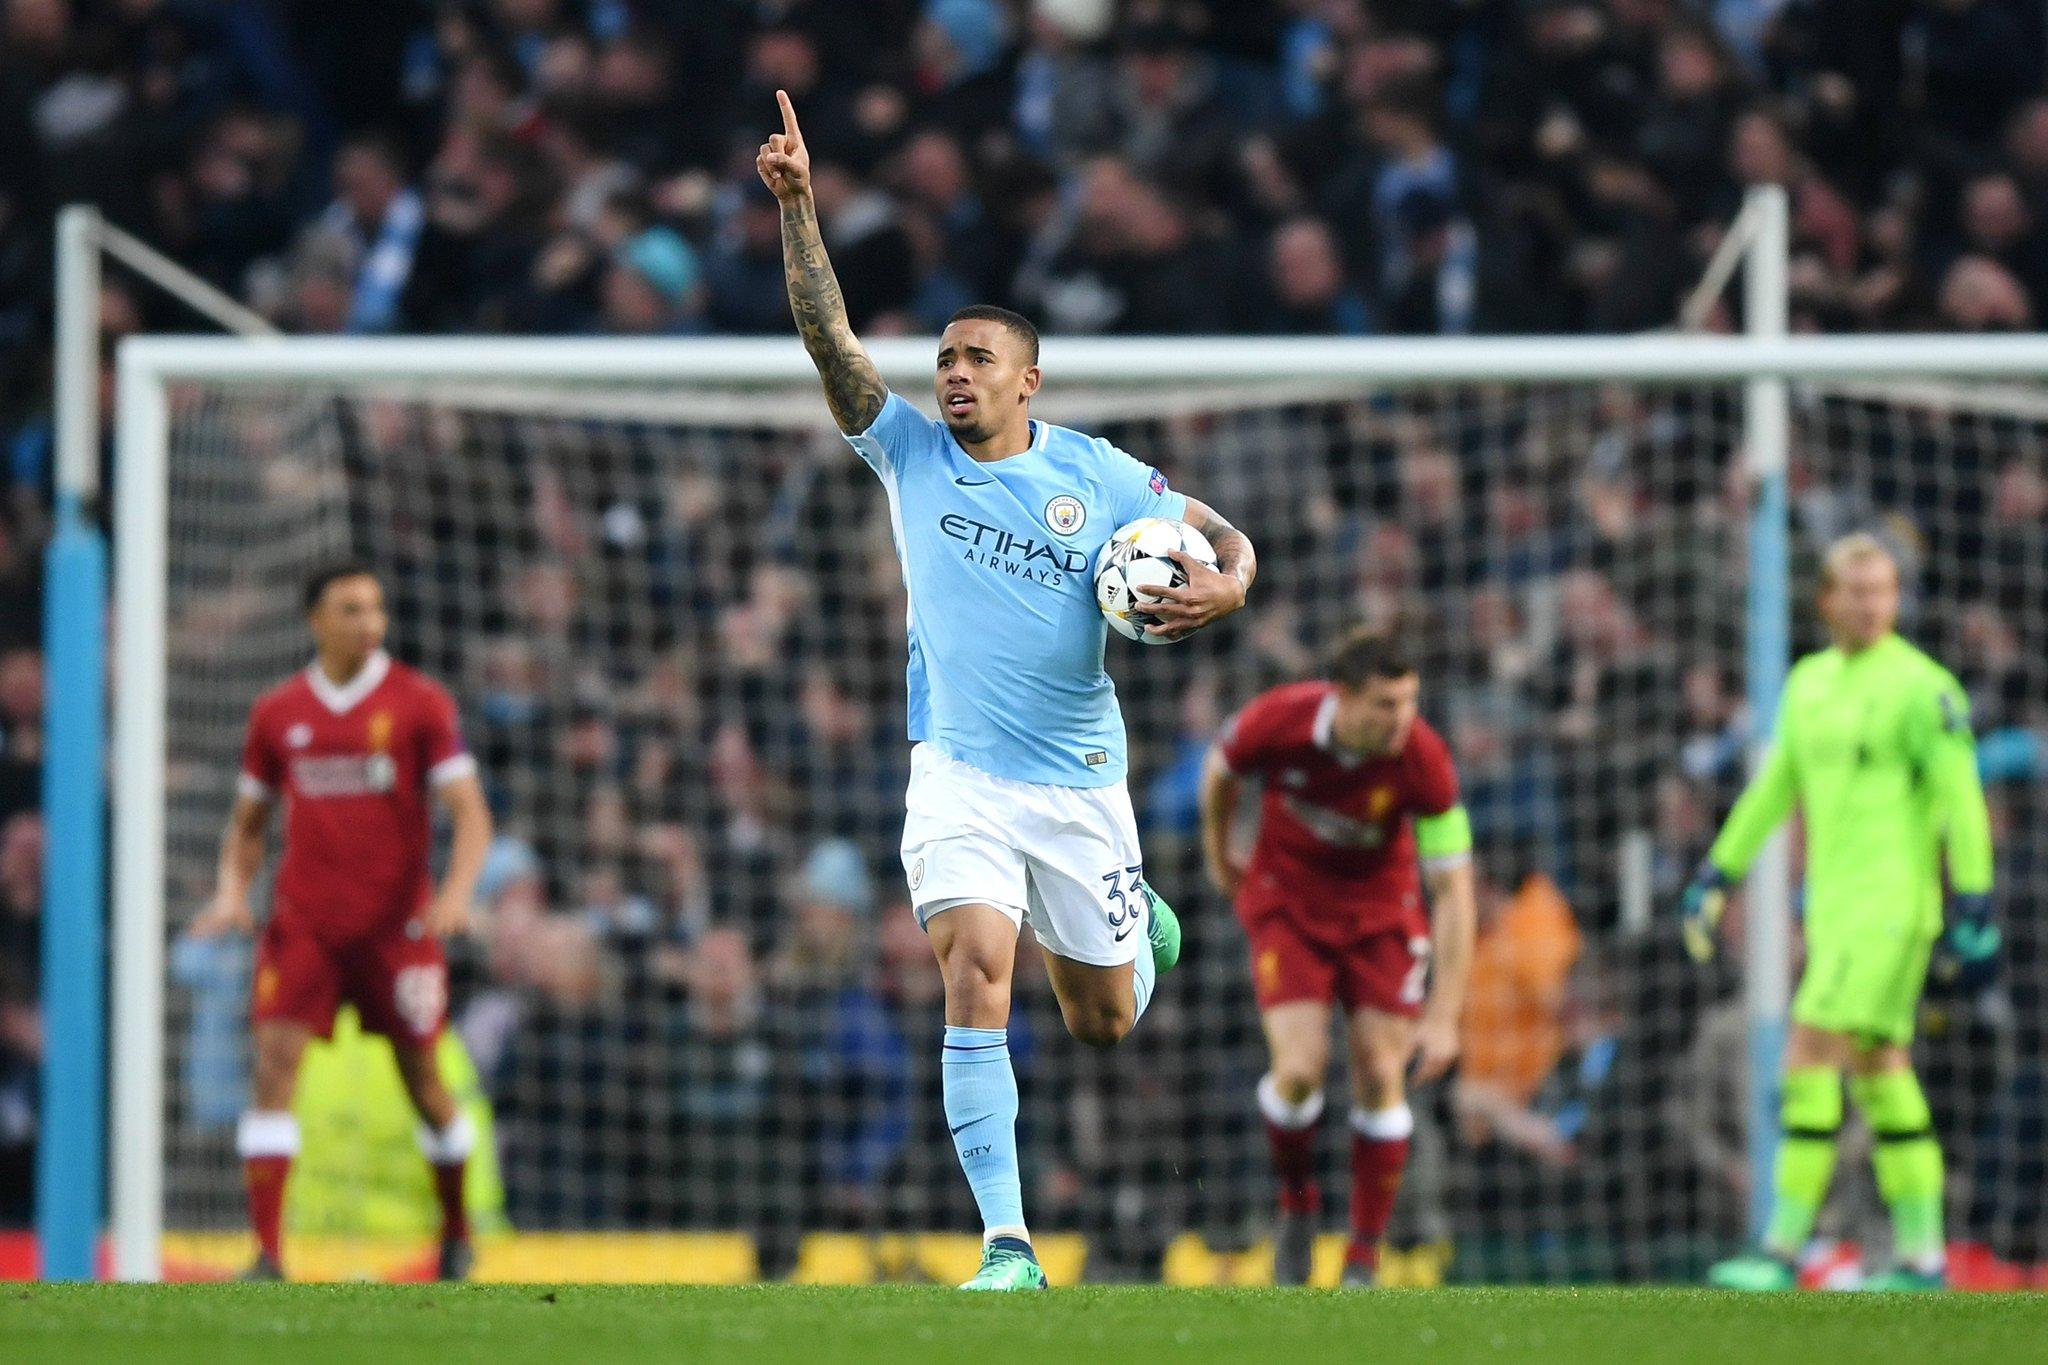 Man City vs Liverpool 1-2 Highlights